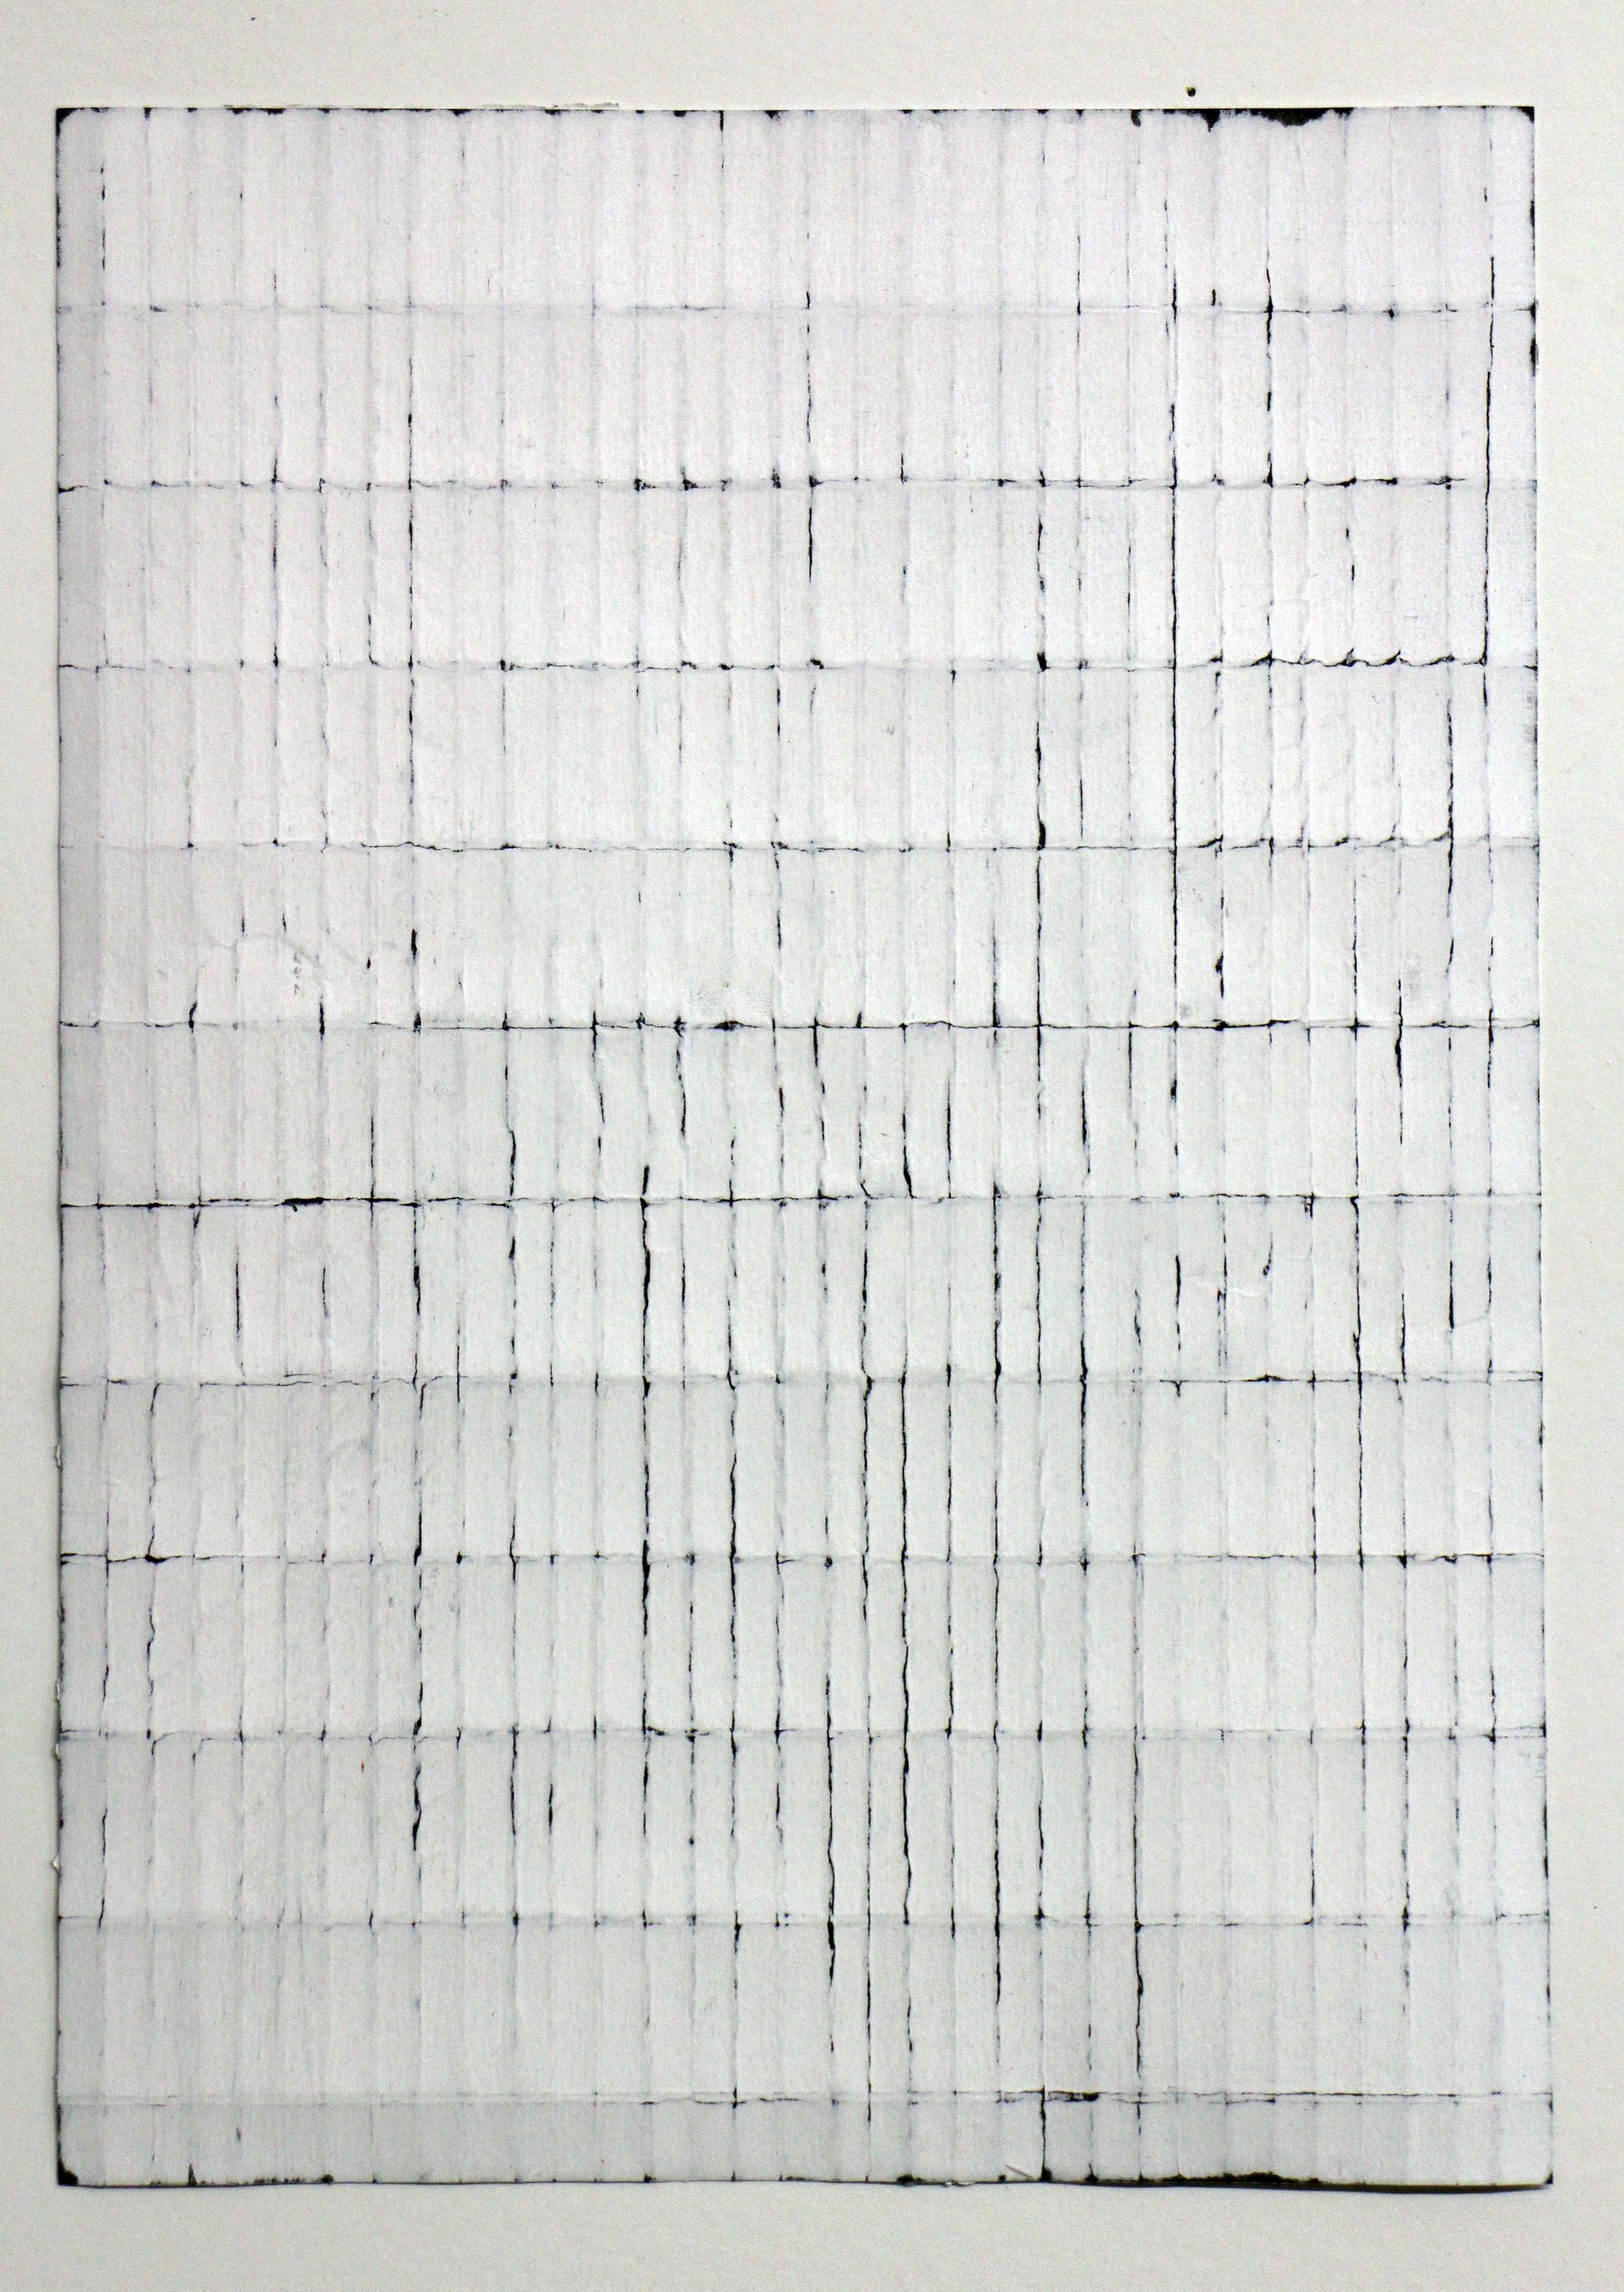 White Black Fold 1x1.4 7.2.16